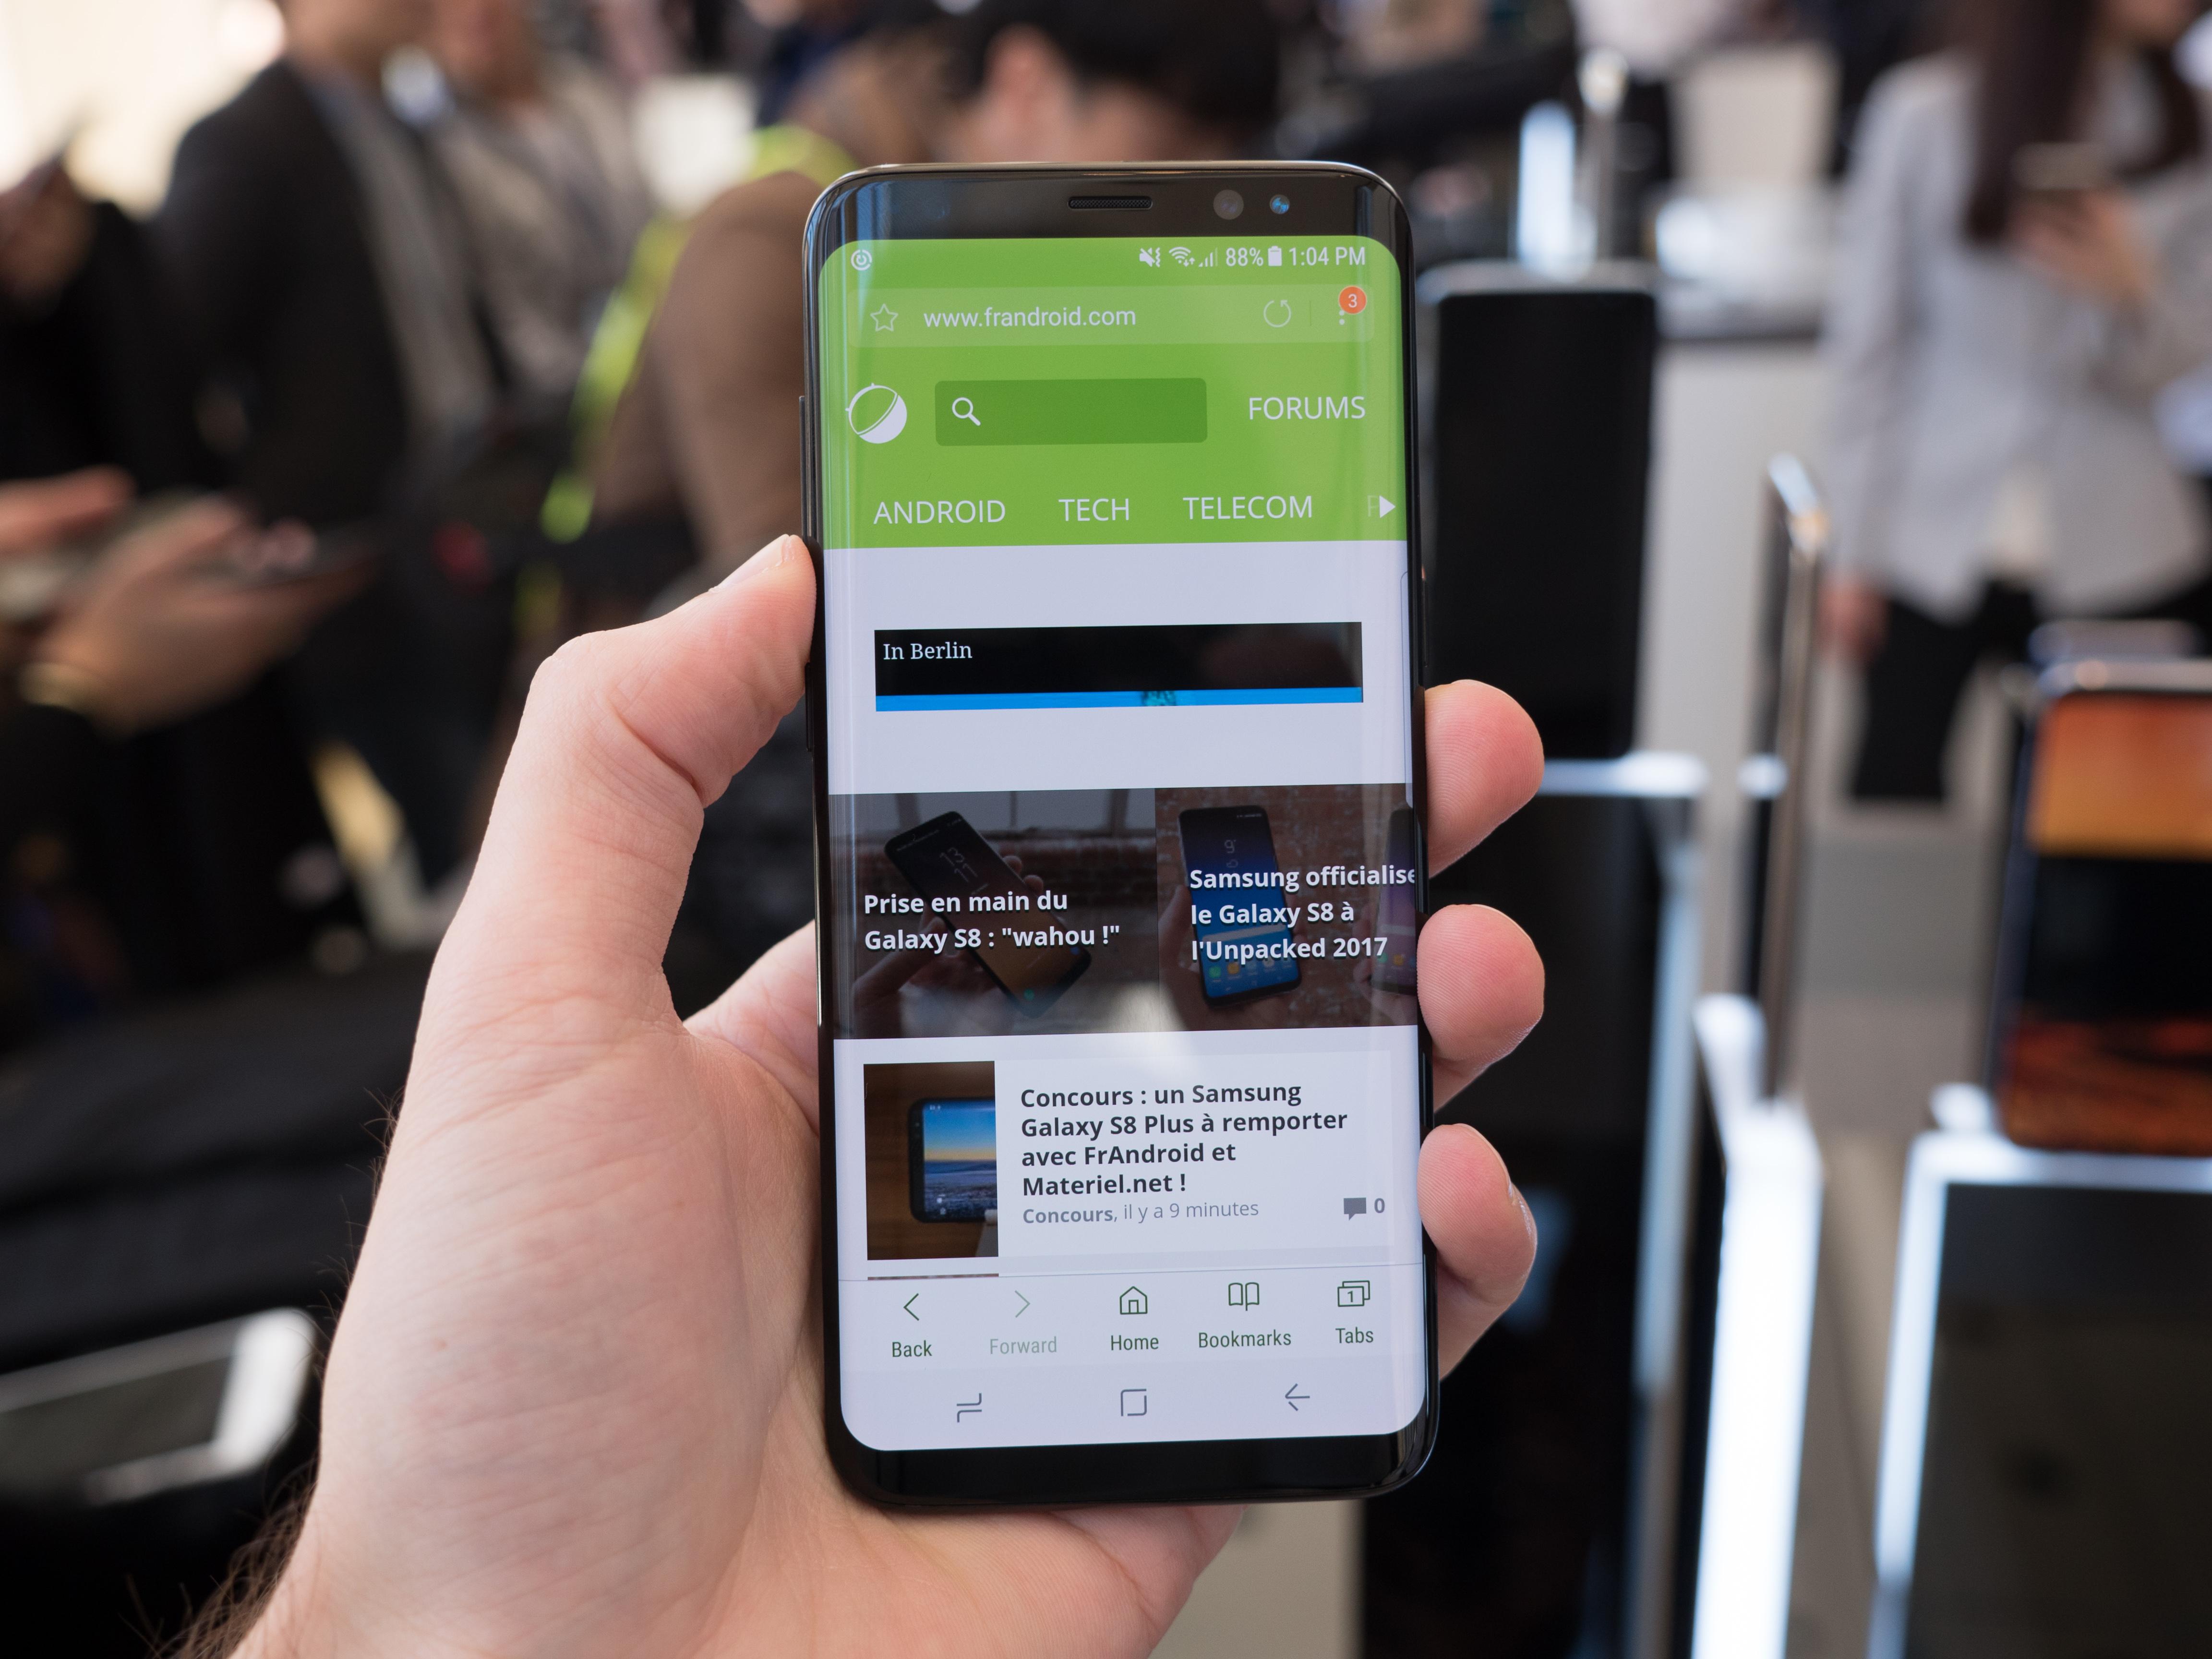 Comparatif Htc U11 Vs Samsung Galaxy S8 Vs Huawei P10 Vs Lg G6 Vs